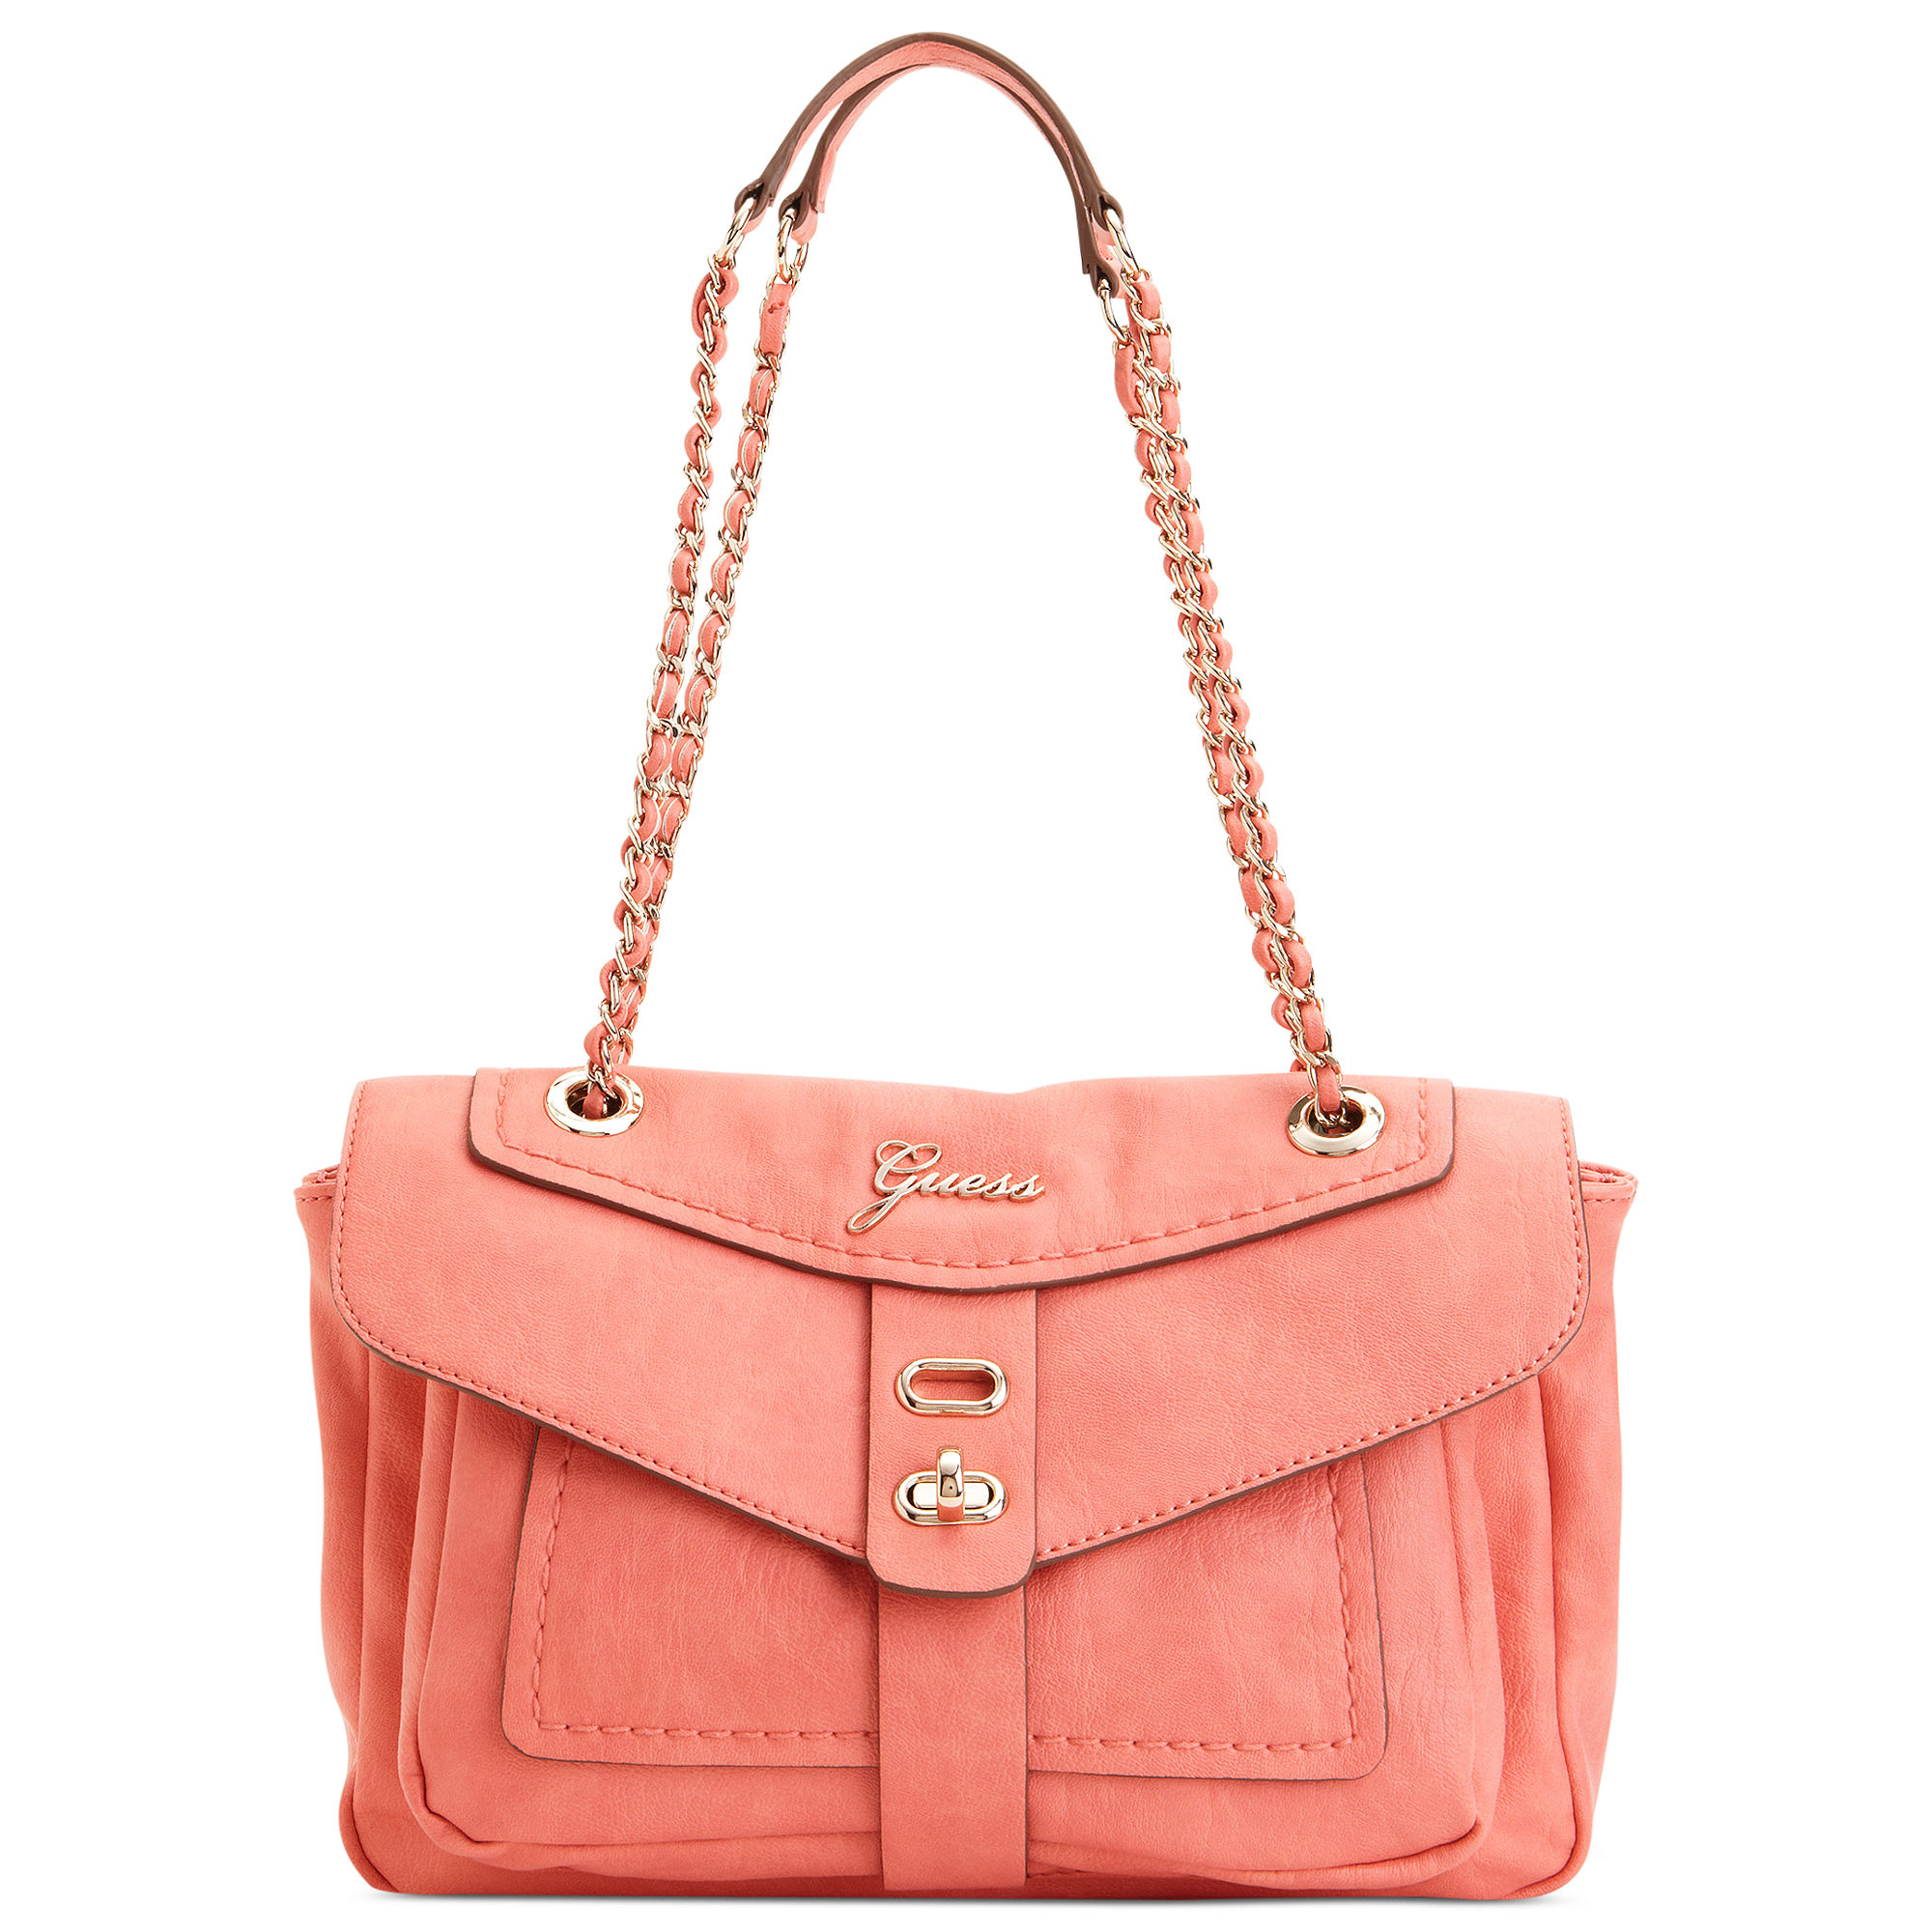 Lyst - Guess Handbag Tremont Flap Shoulder